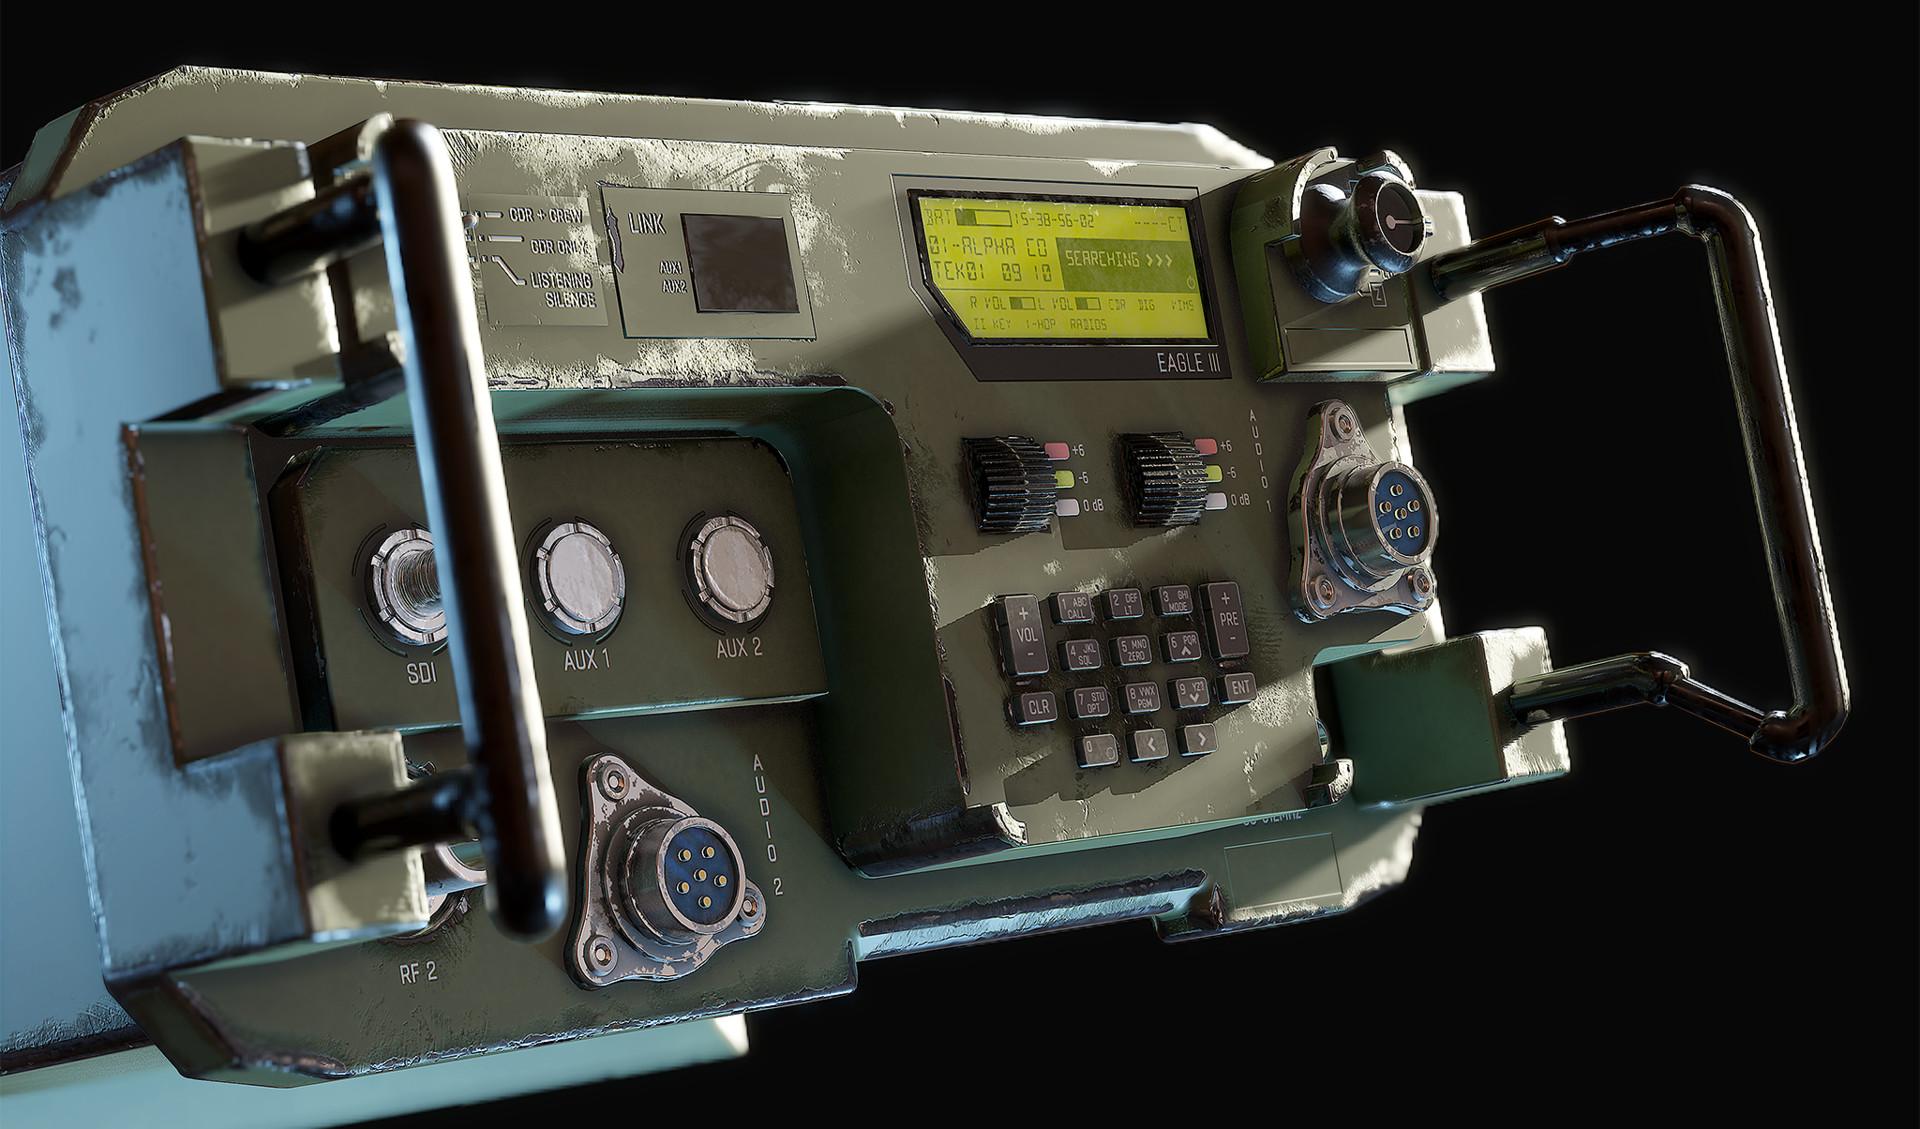 Hannu koivuranta militaryradio detail 1